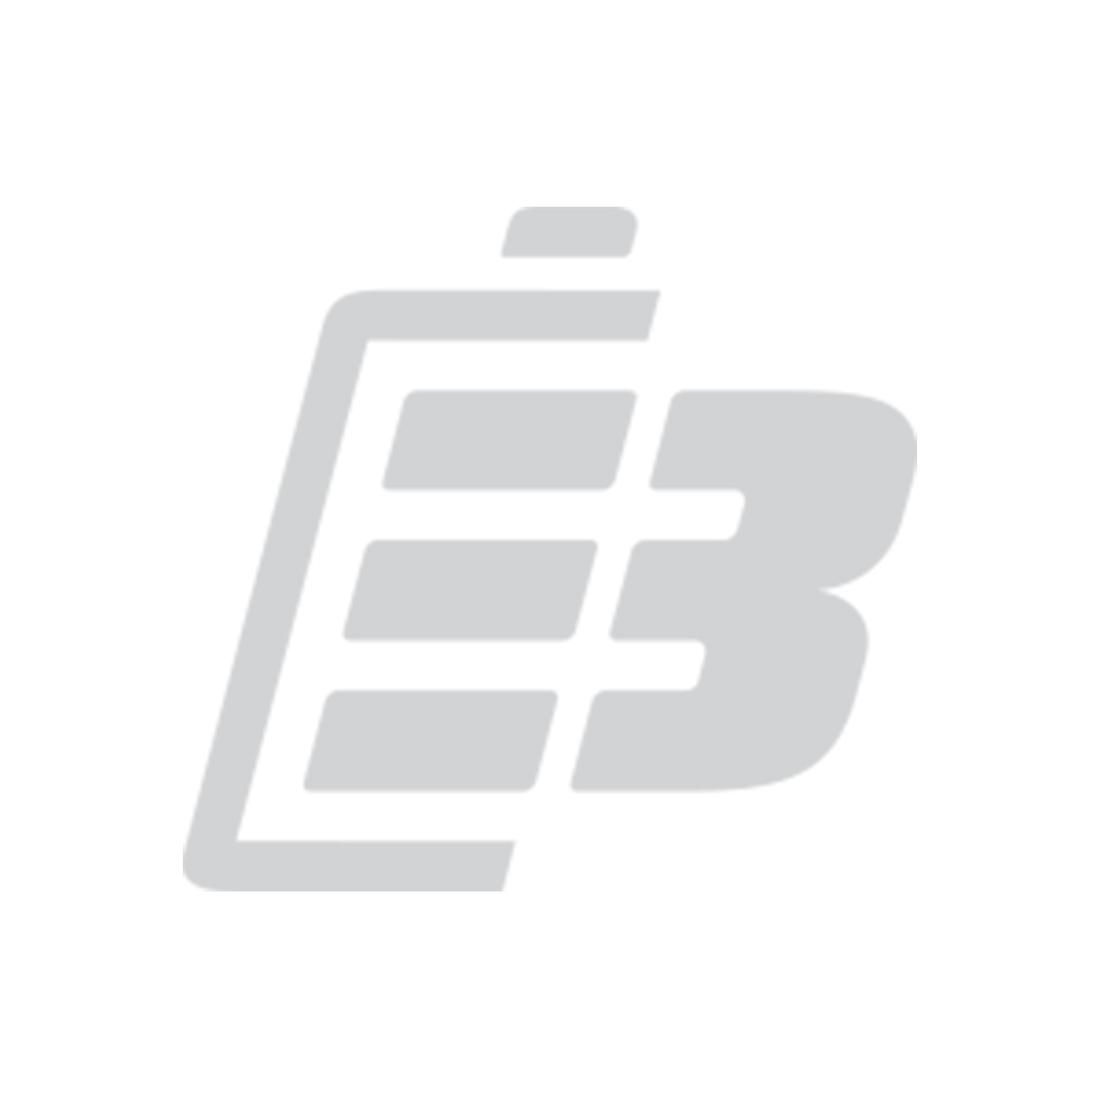 Fenix WT25R LED Work Flashlight